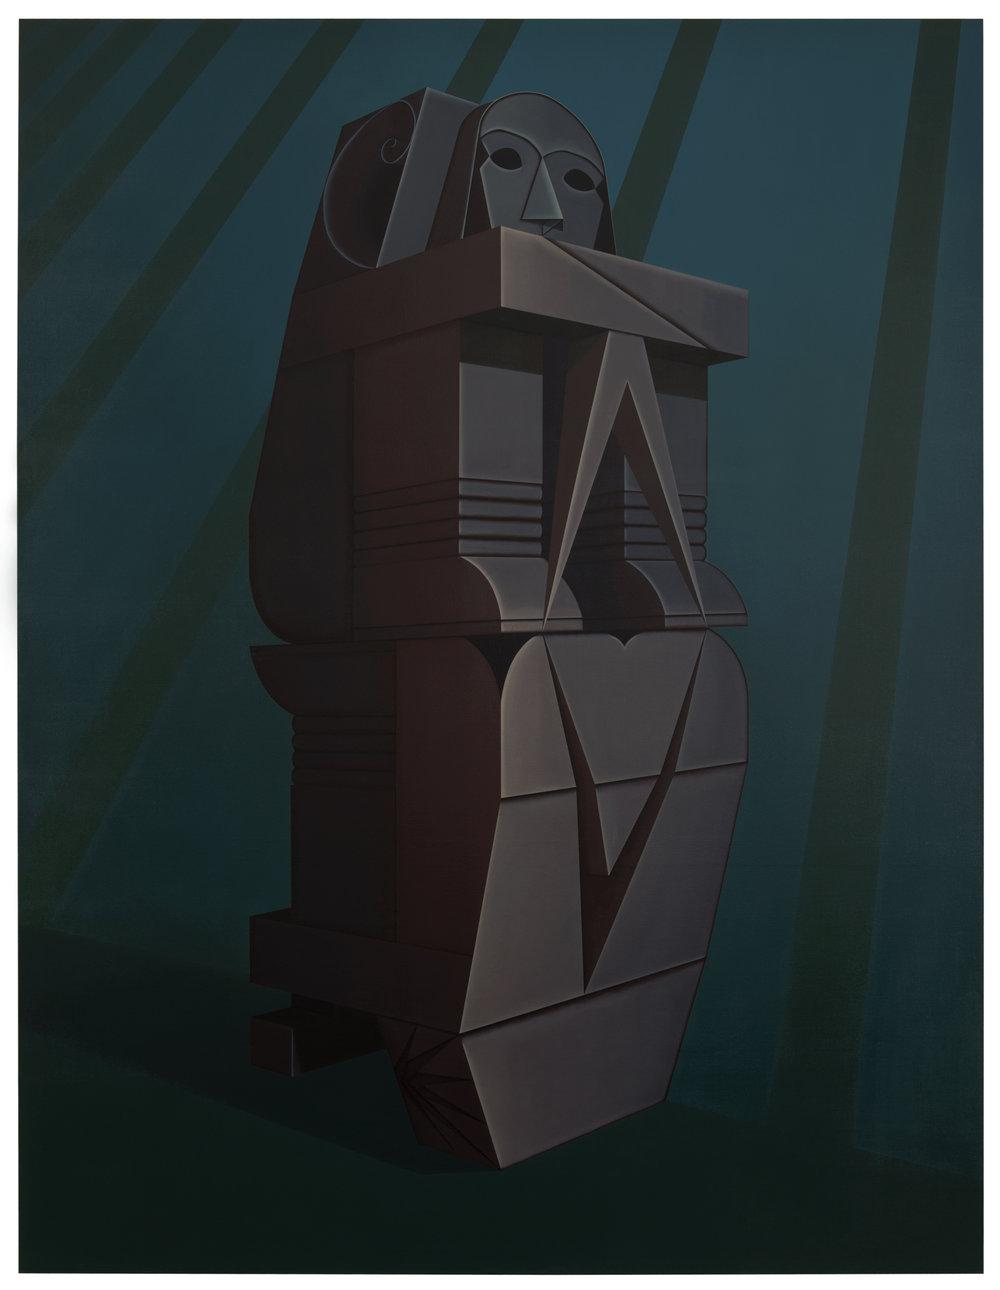 Dale Adcock, Validator, 2012, Oil on Linen; 260 x 199 cm.